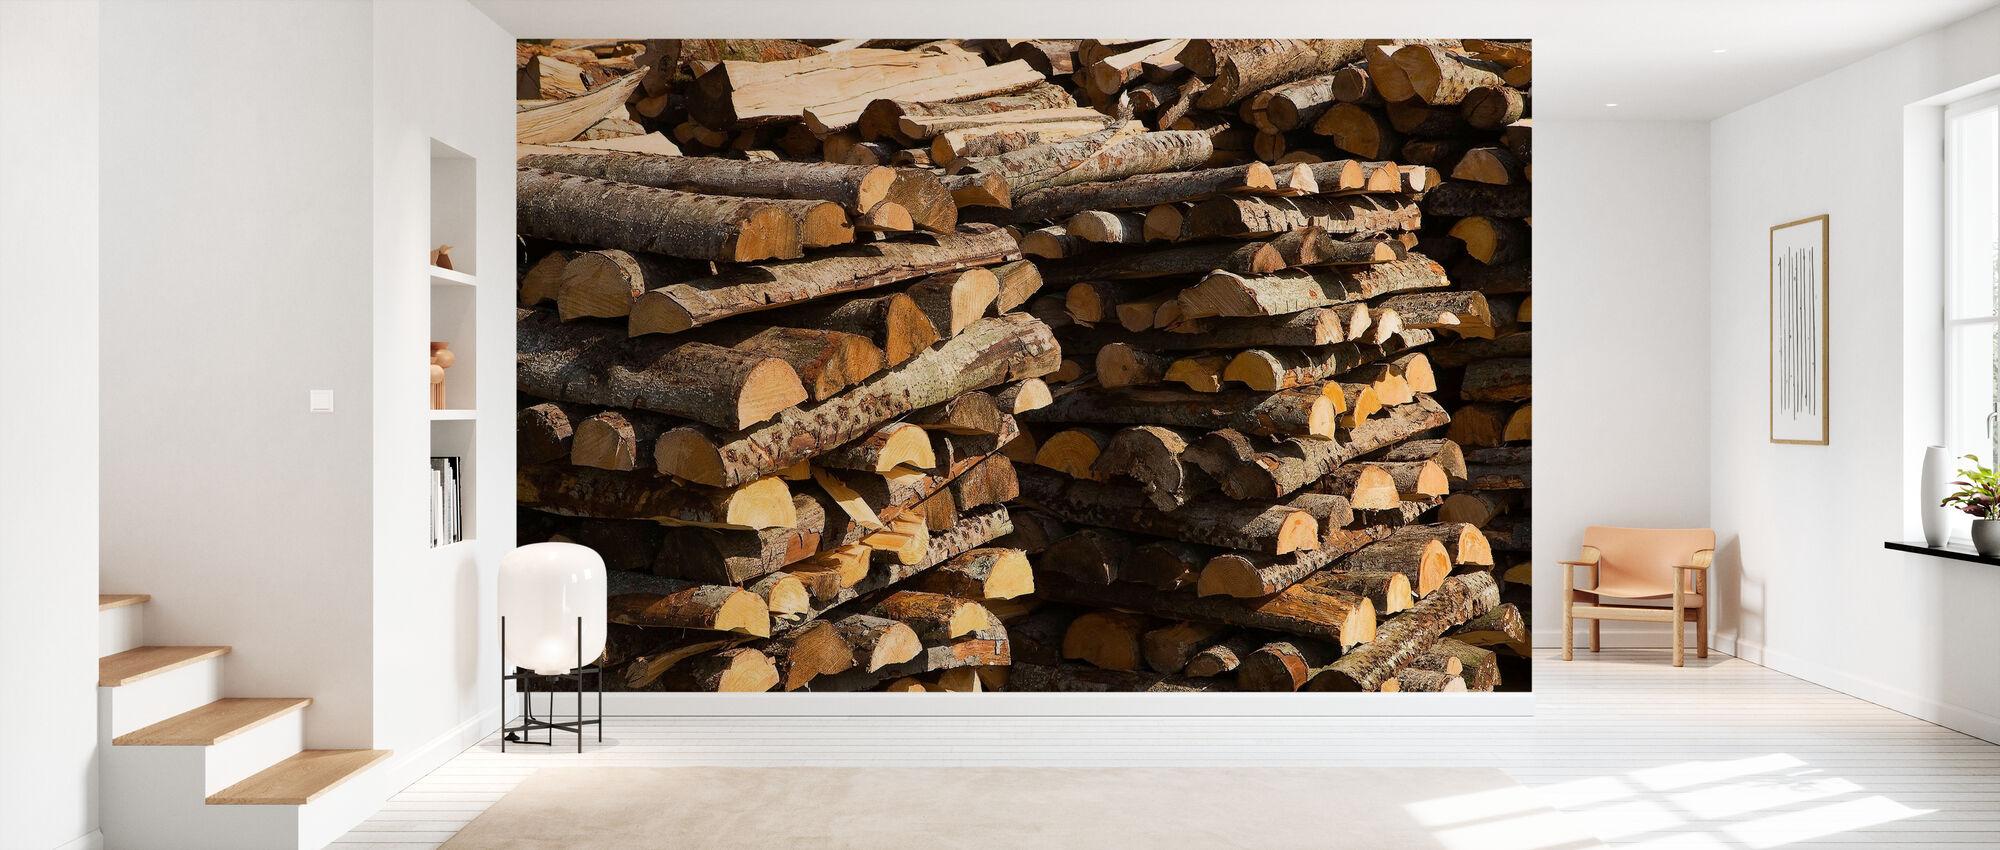 Stacks of Wood - Wallpaper - Hallway